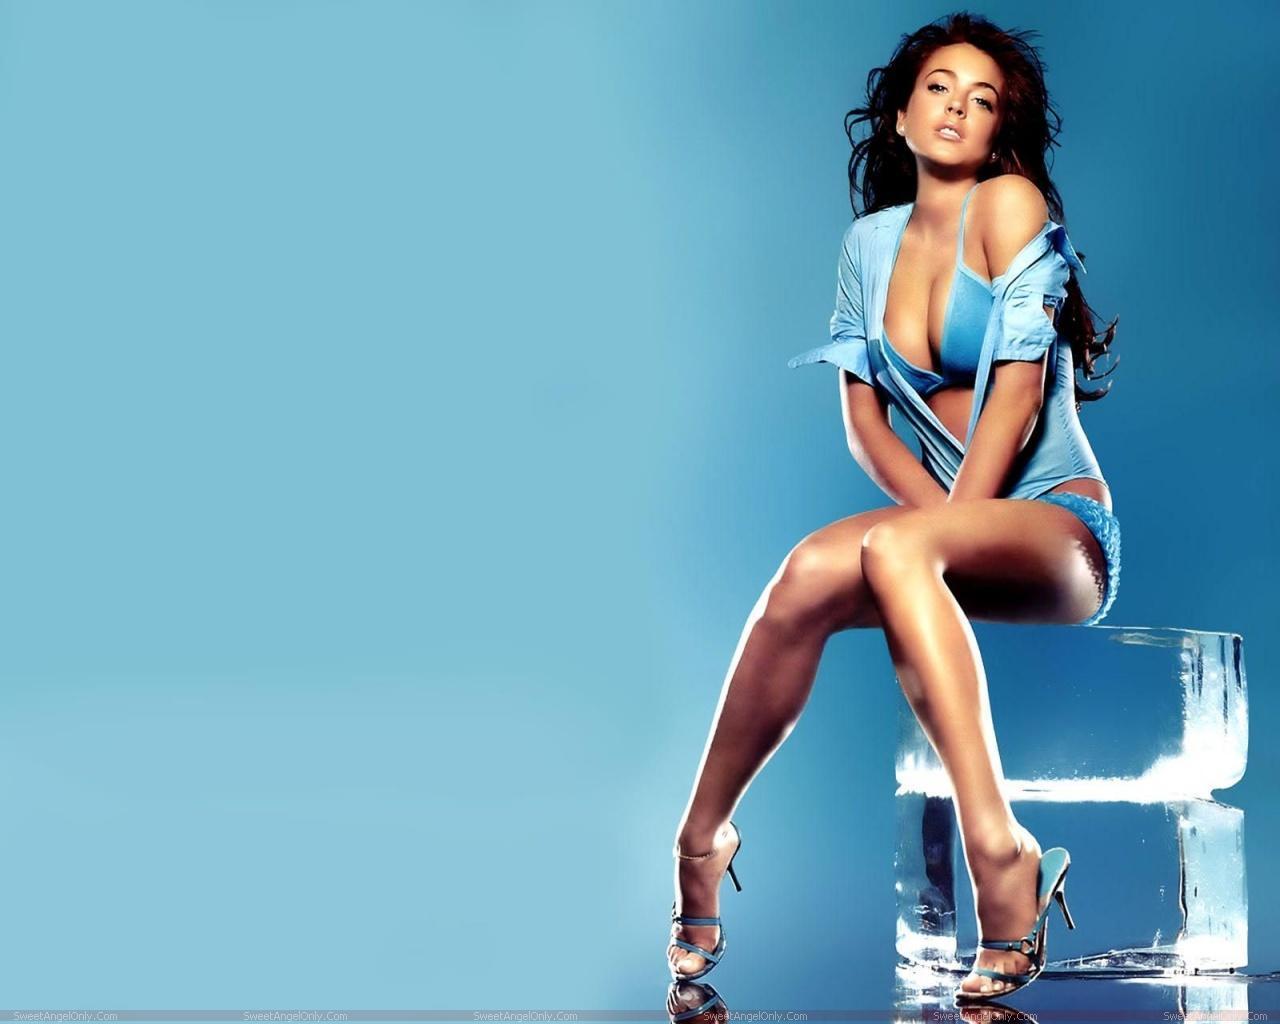 http://1.bp.blogspot.com/-OznS9xTHJWE/TYcCXFuzbiI/AAAAAAAAFvc/w6dz14c6AD8/s1600/lindsay_lohan_hollywood_hot_actress_wallpaper_sweetangelonly_25.jpg